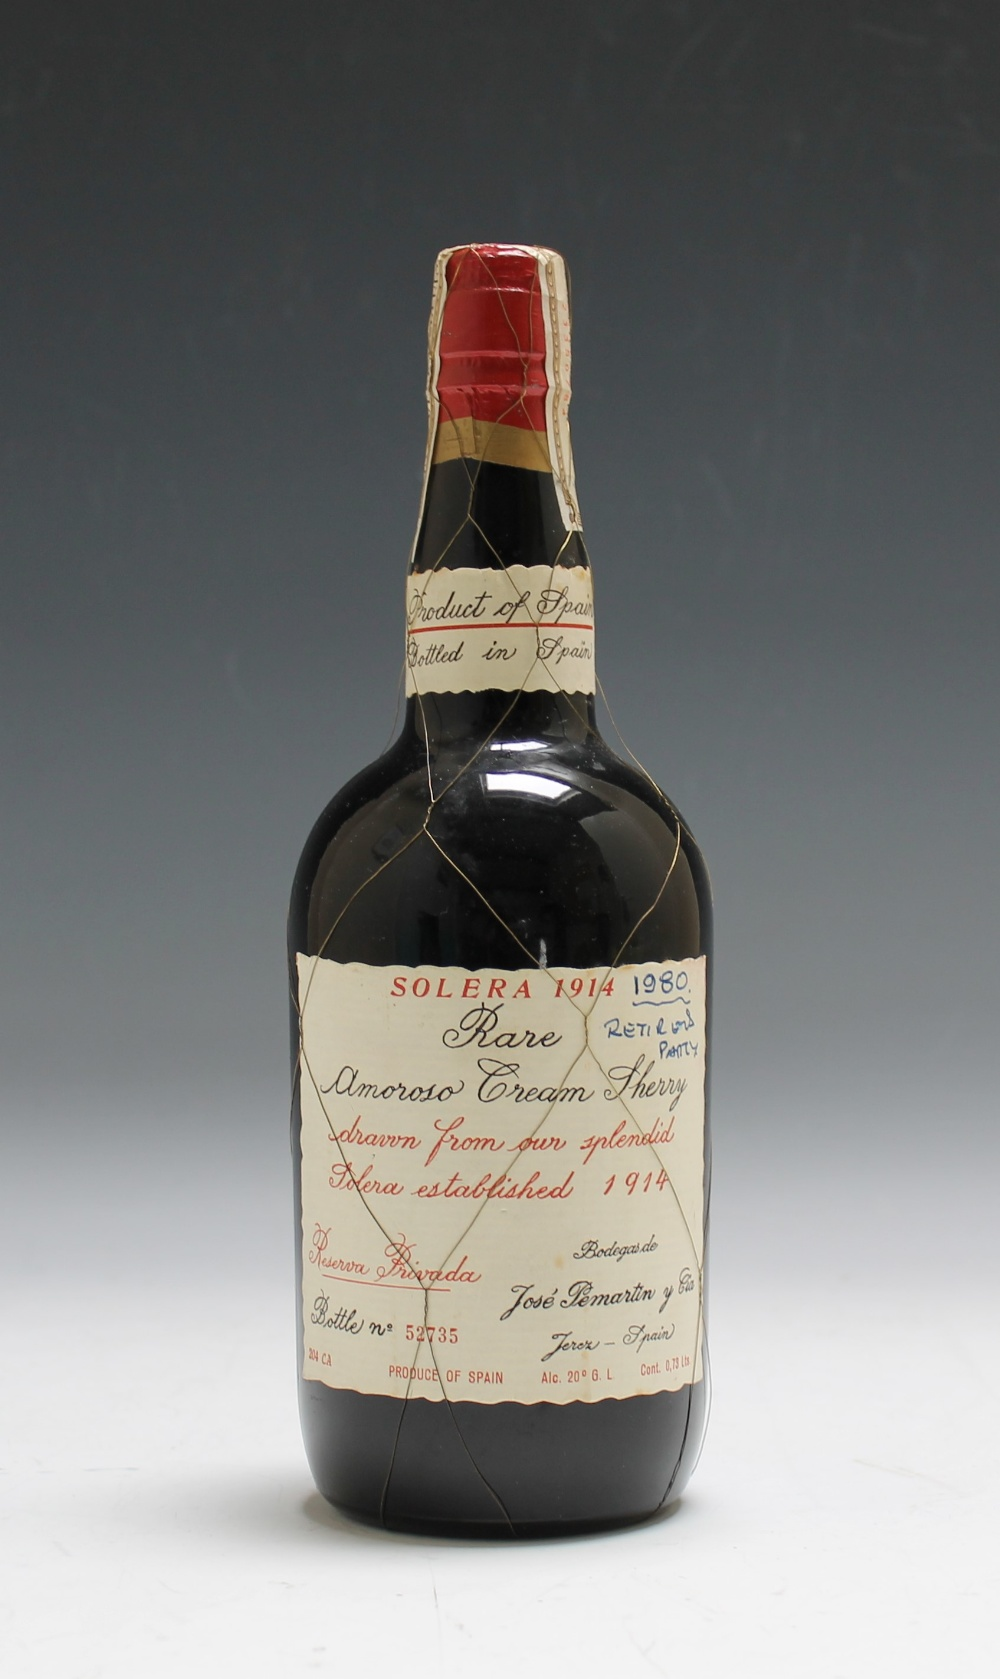 1 BOTTLE OF SOLERA 1914 RARE AMOROSO CREAM SHERRY, drawn from 'our splendid Solera established 1914,